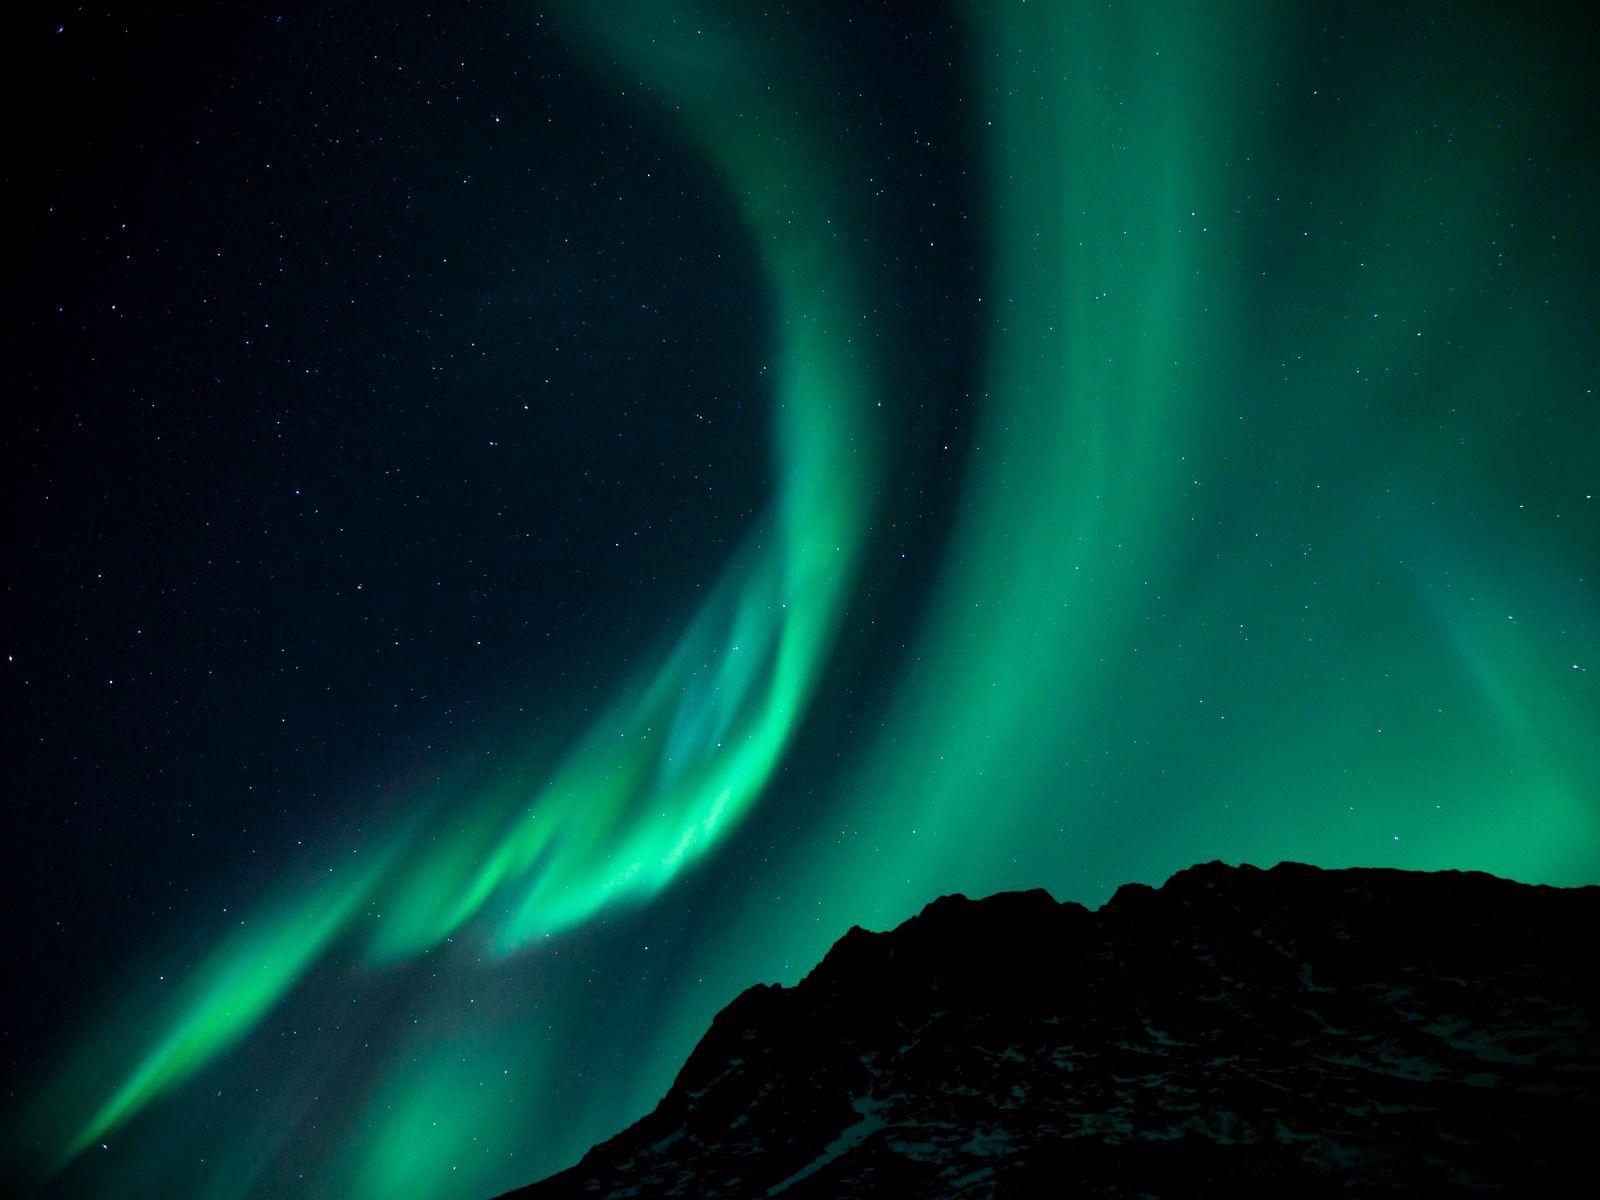 1600x1200 Wallpaper northern lights, night, night sky, phenomenon